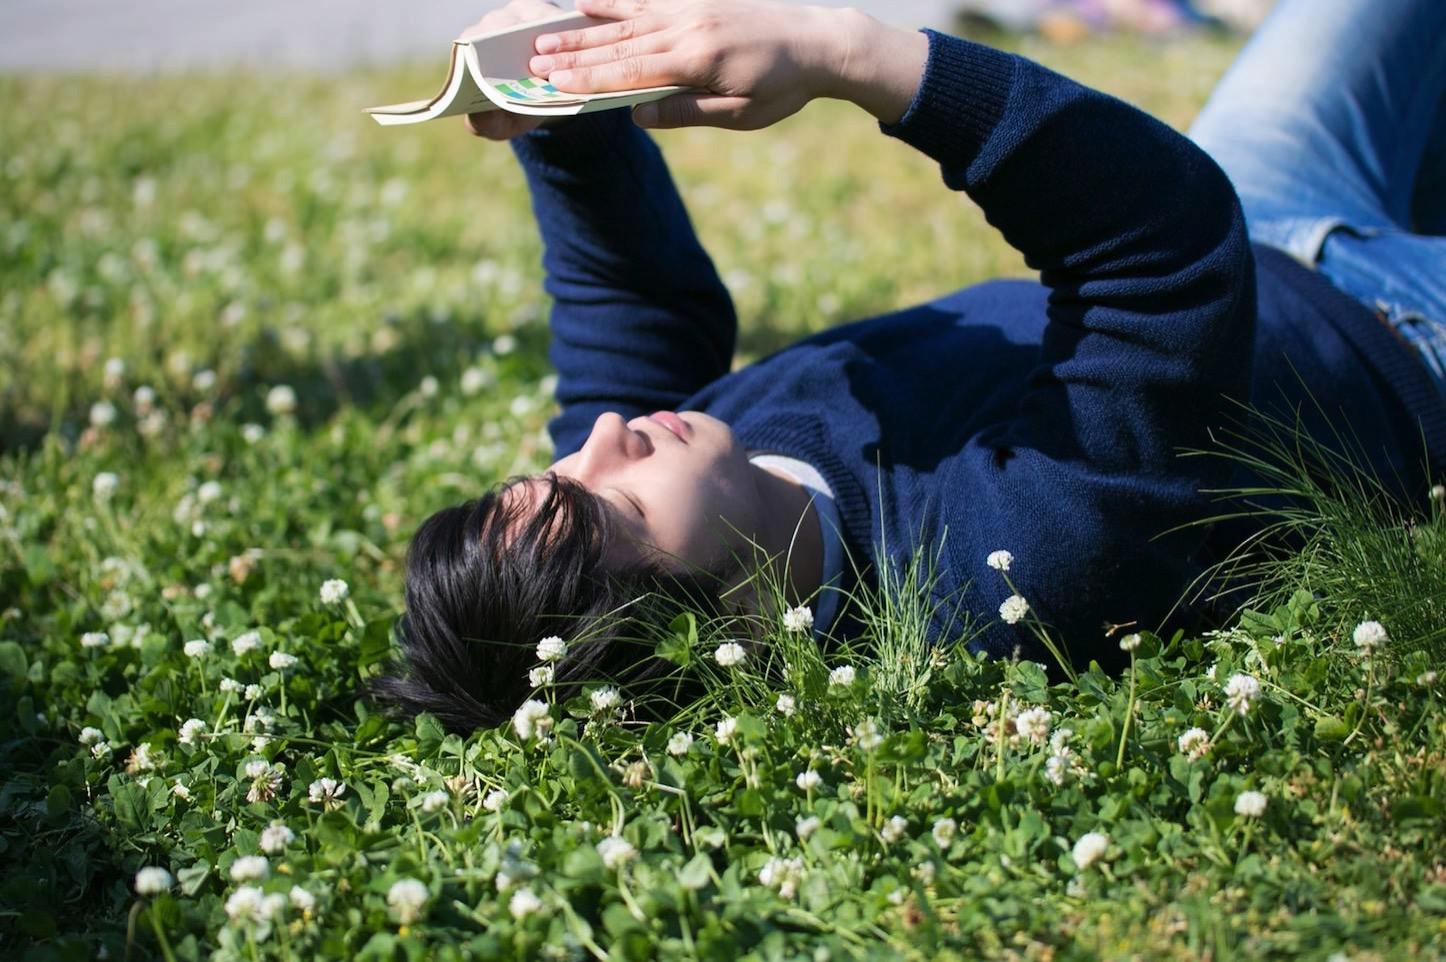 Ookawa Reading on Grass